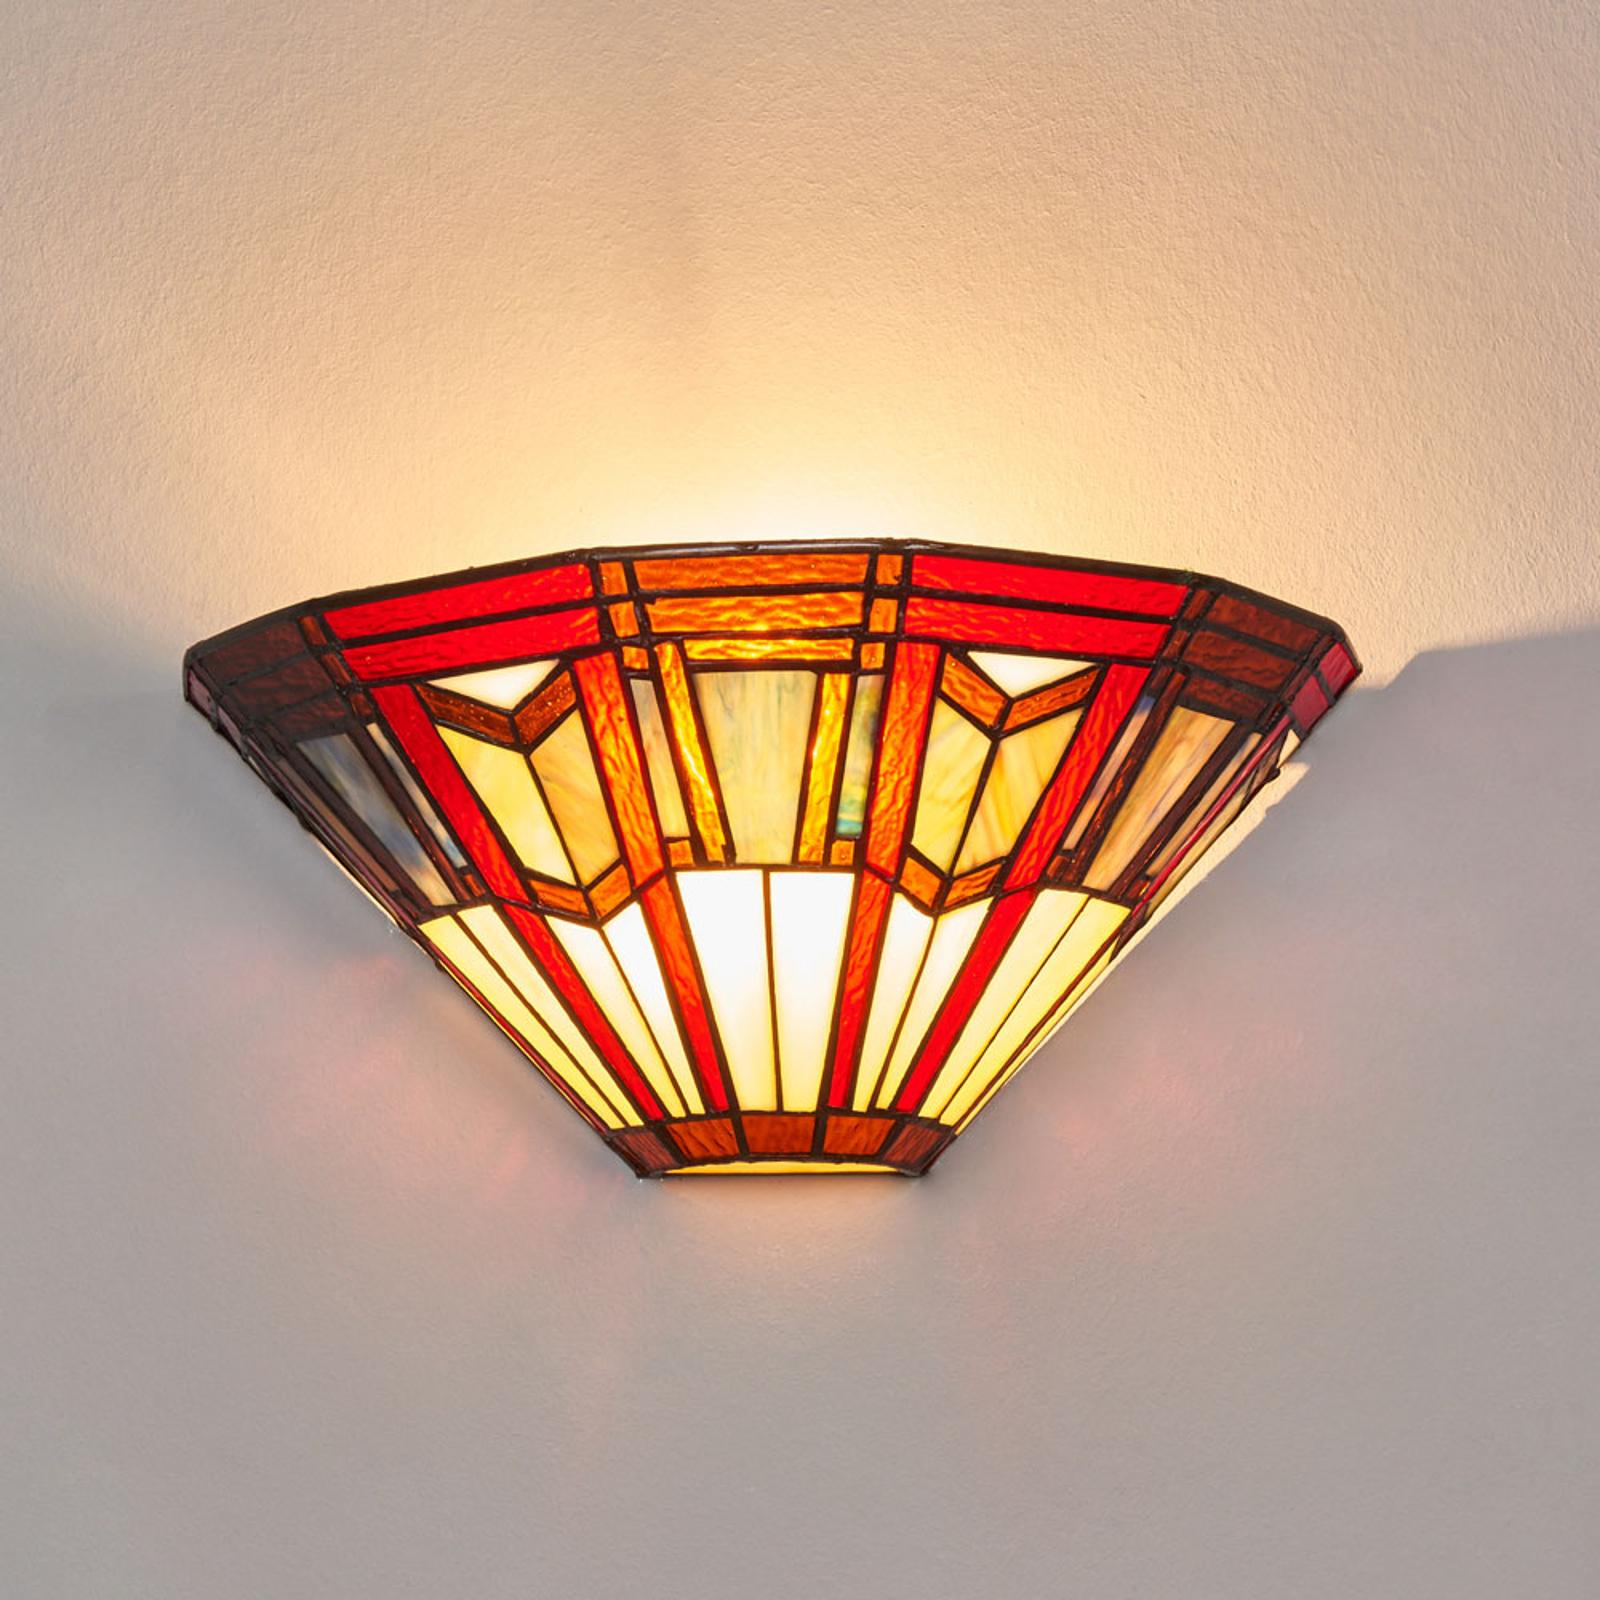 LILLIE wandlamp in Tiffany-stijl